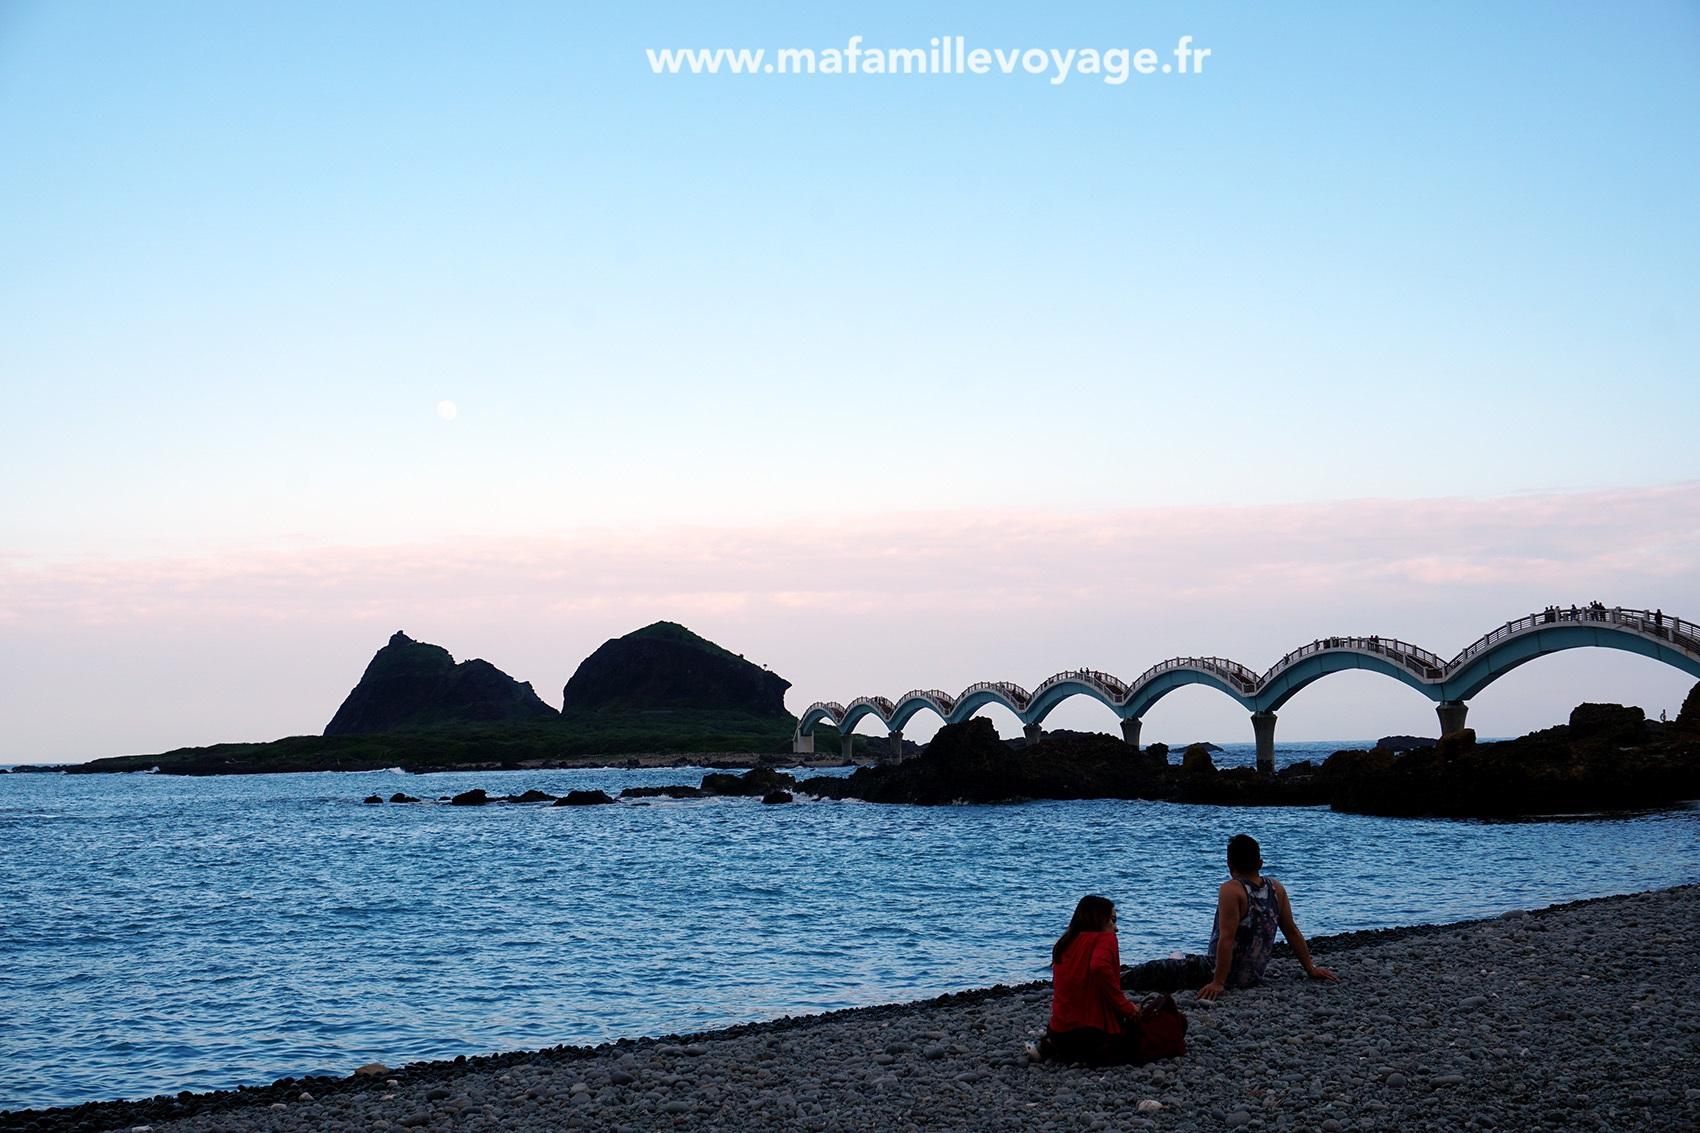 Sanxiantai Arch Bridge